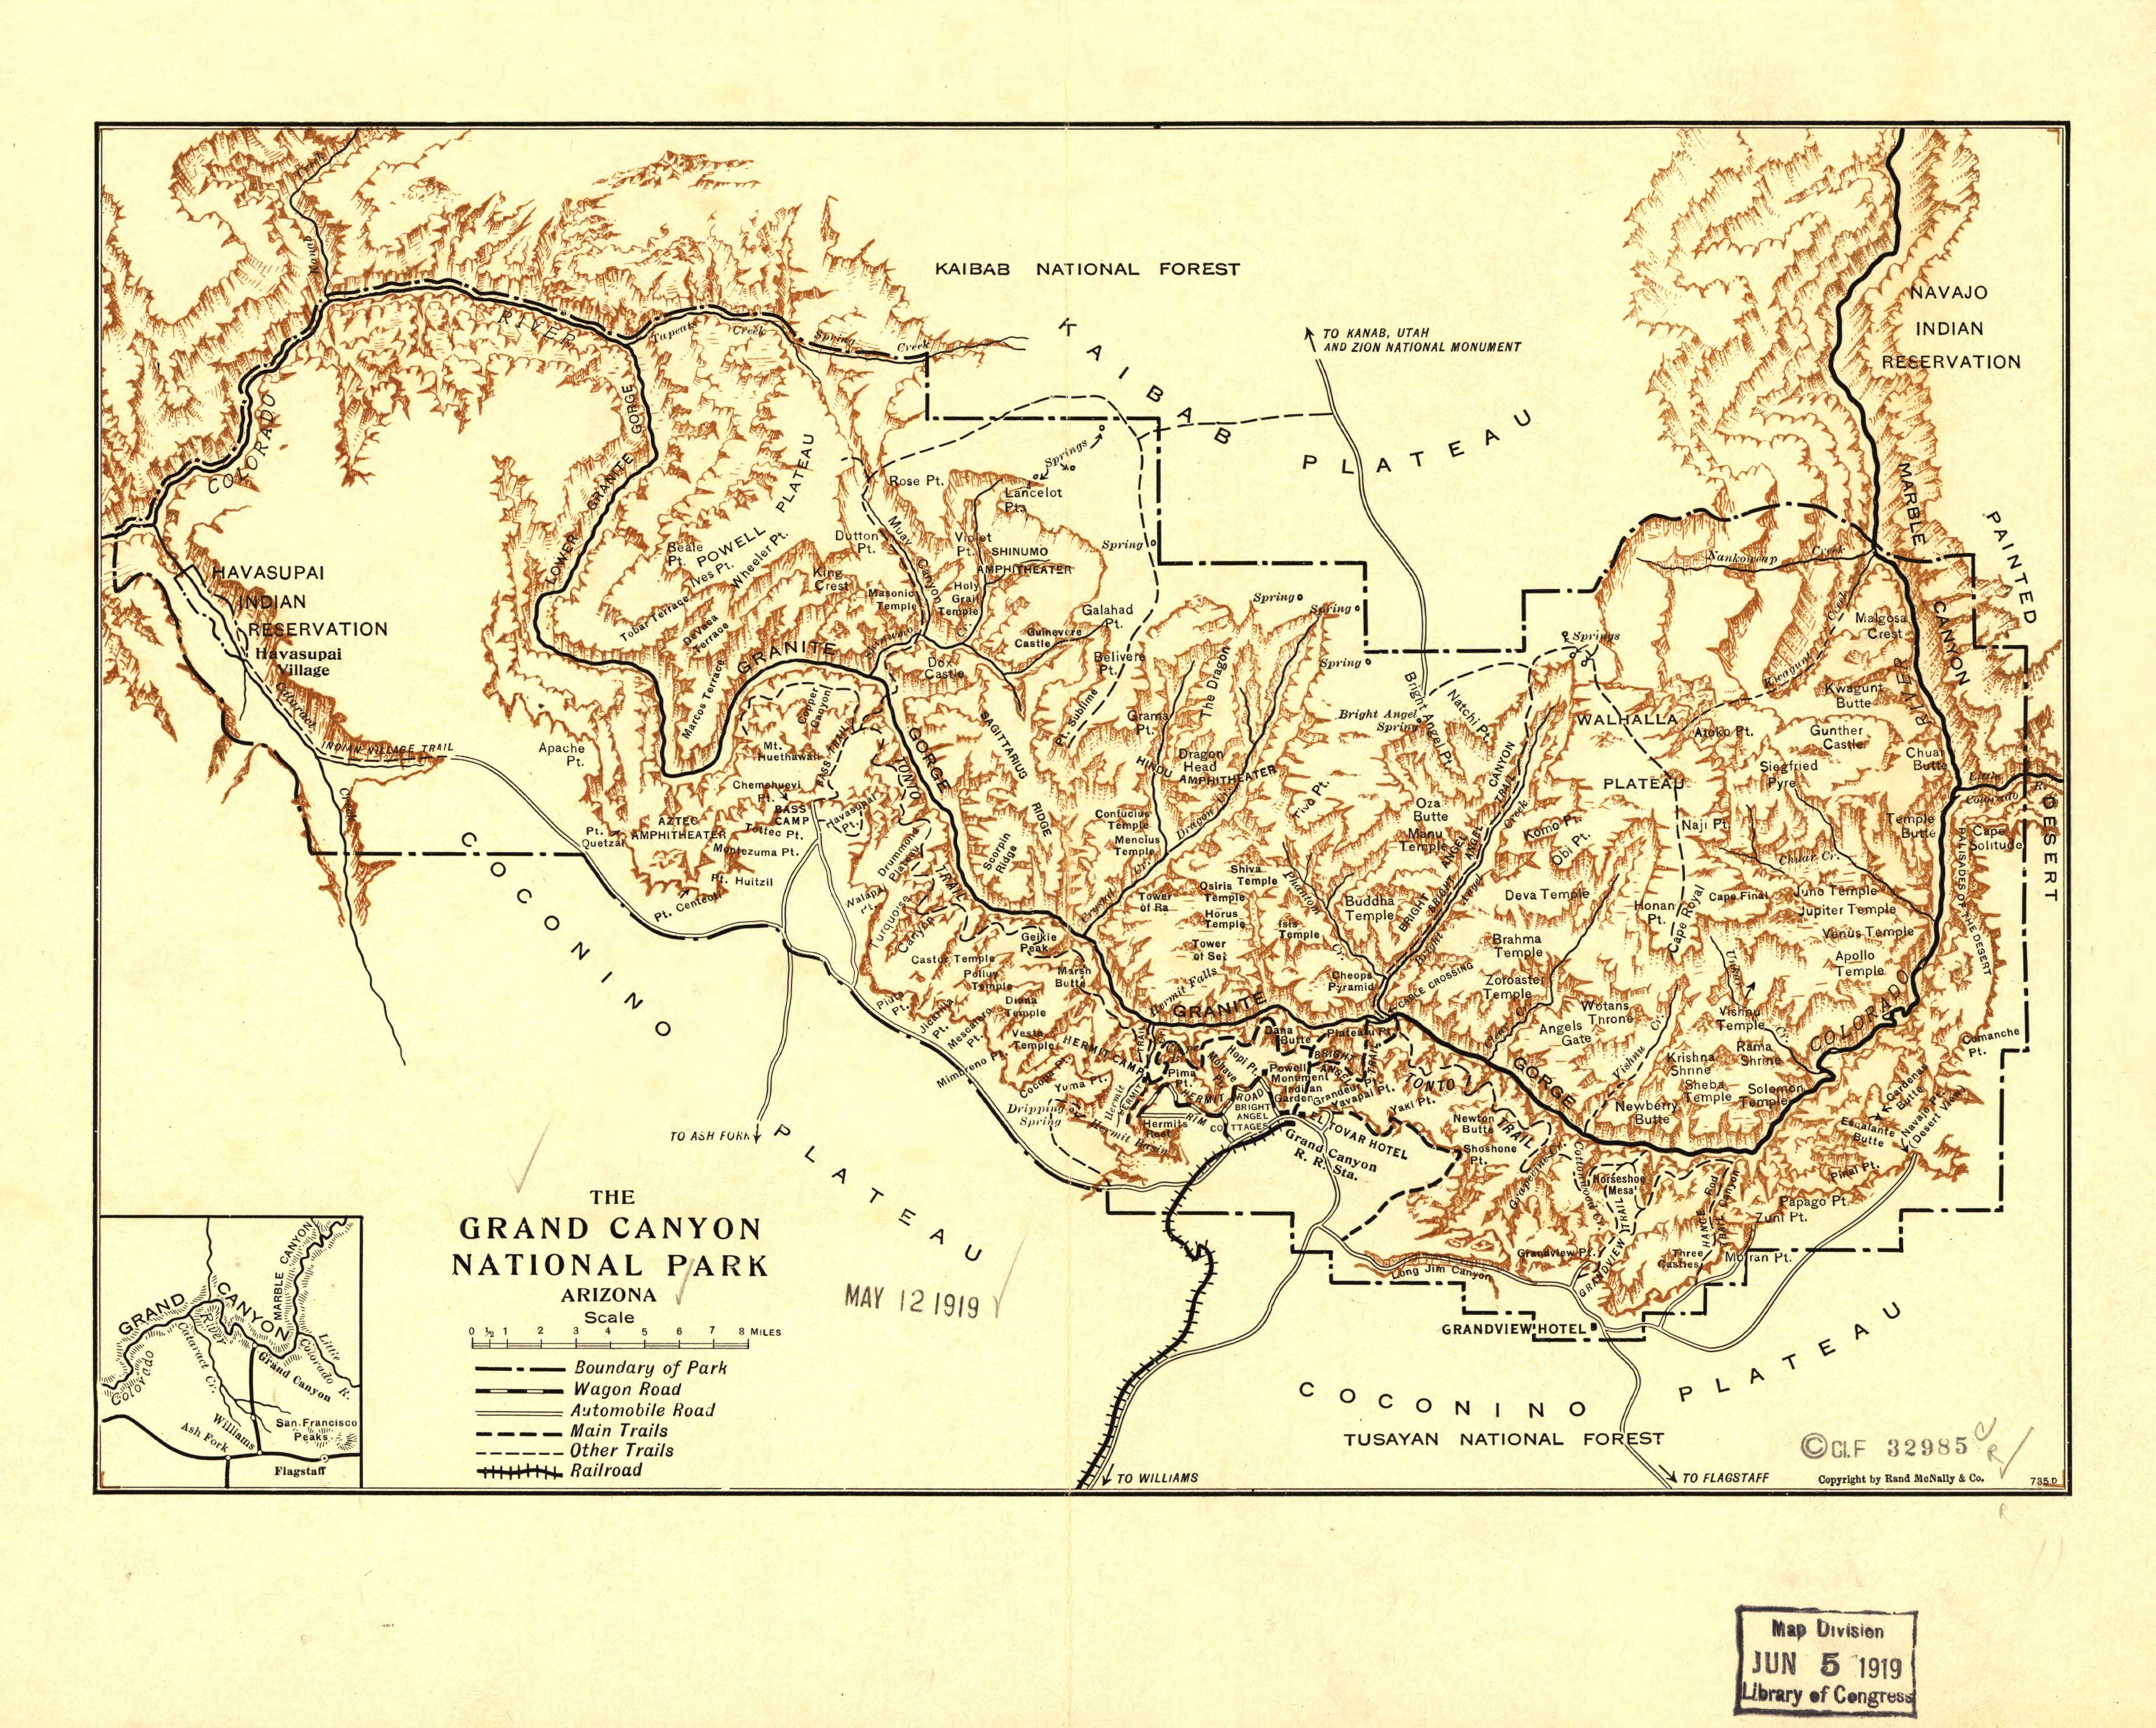 Map Of Arizona Grand Canyon Area.File Grand Canyon National Park Arizona Loc 98687192 Jpg